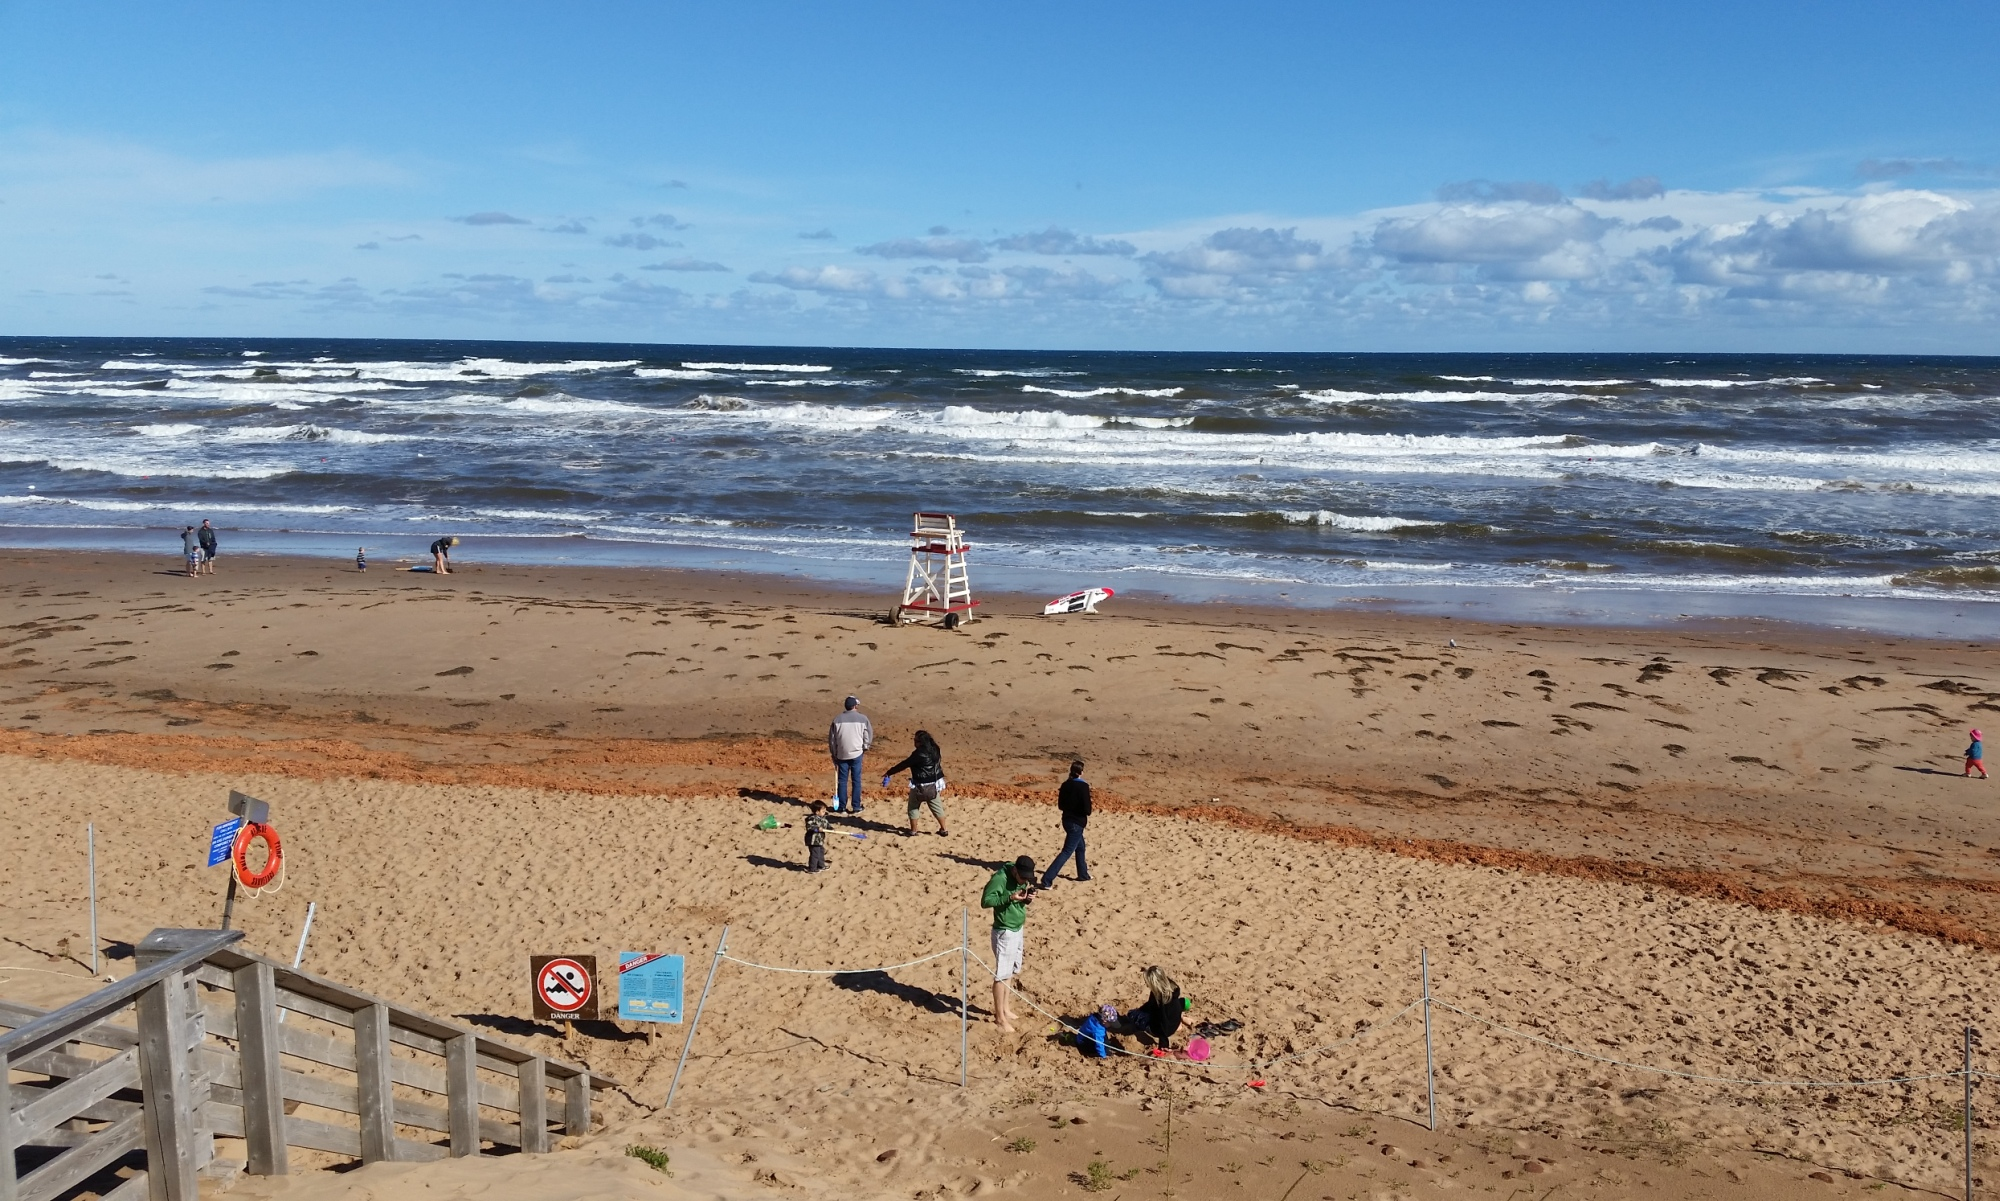 Cavendish-Beach-waves-20160830_100828